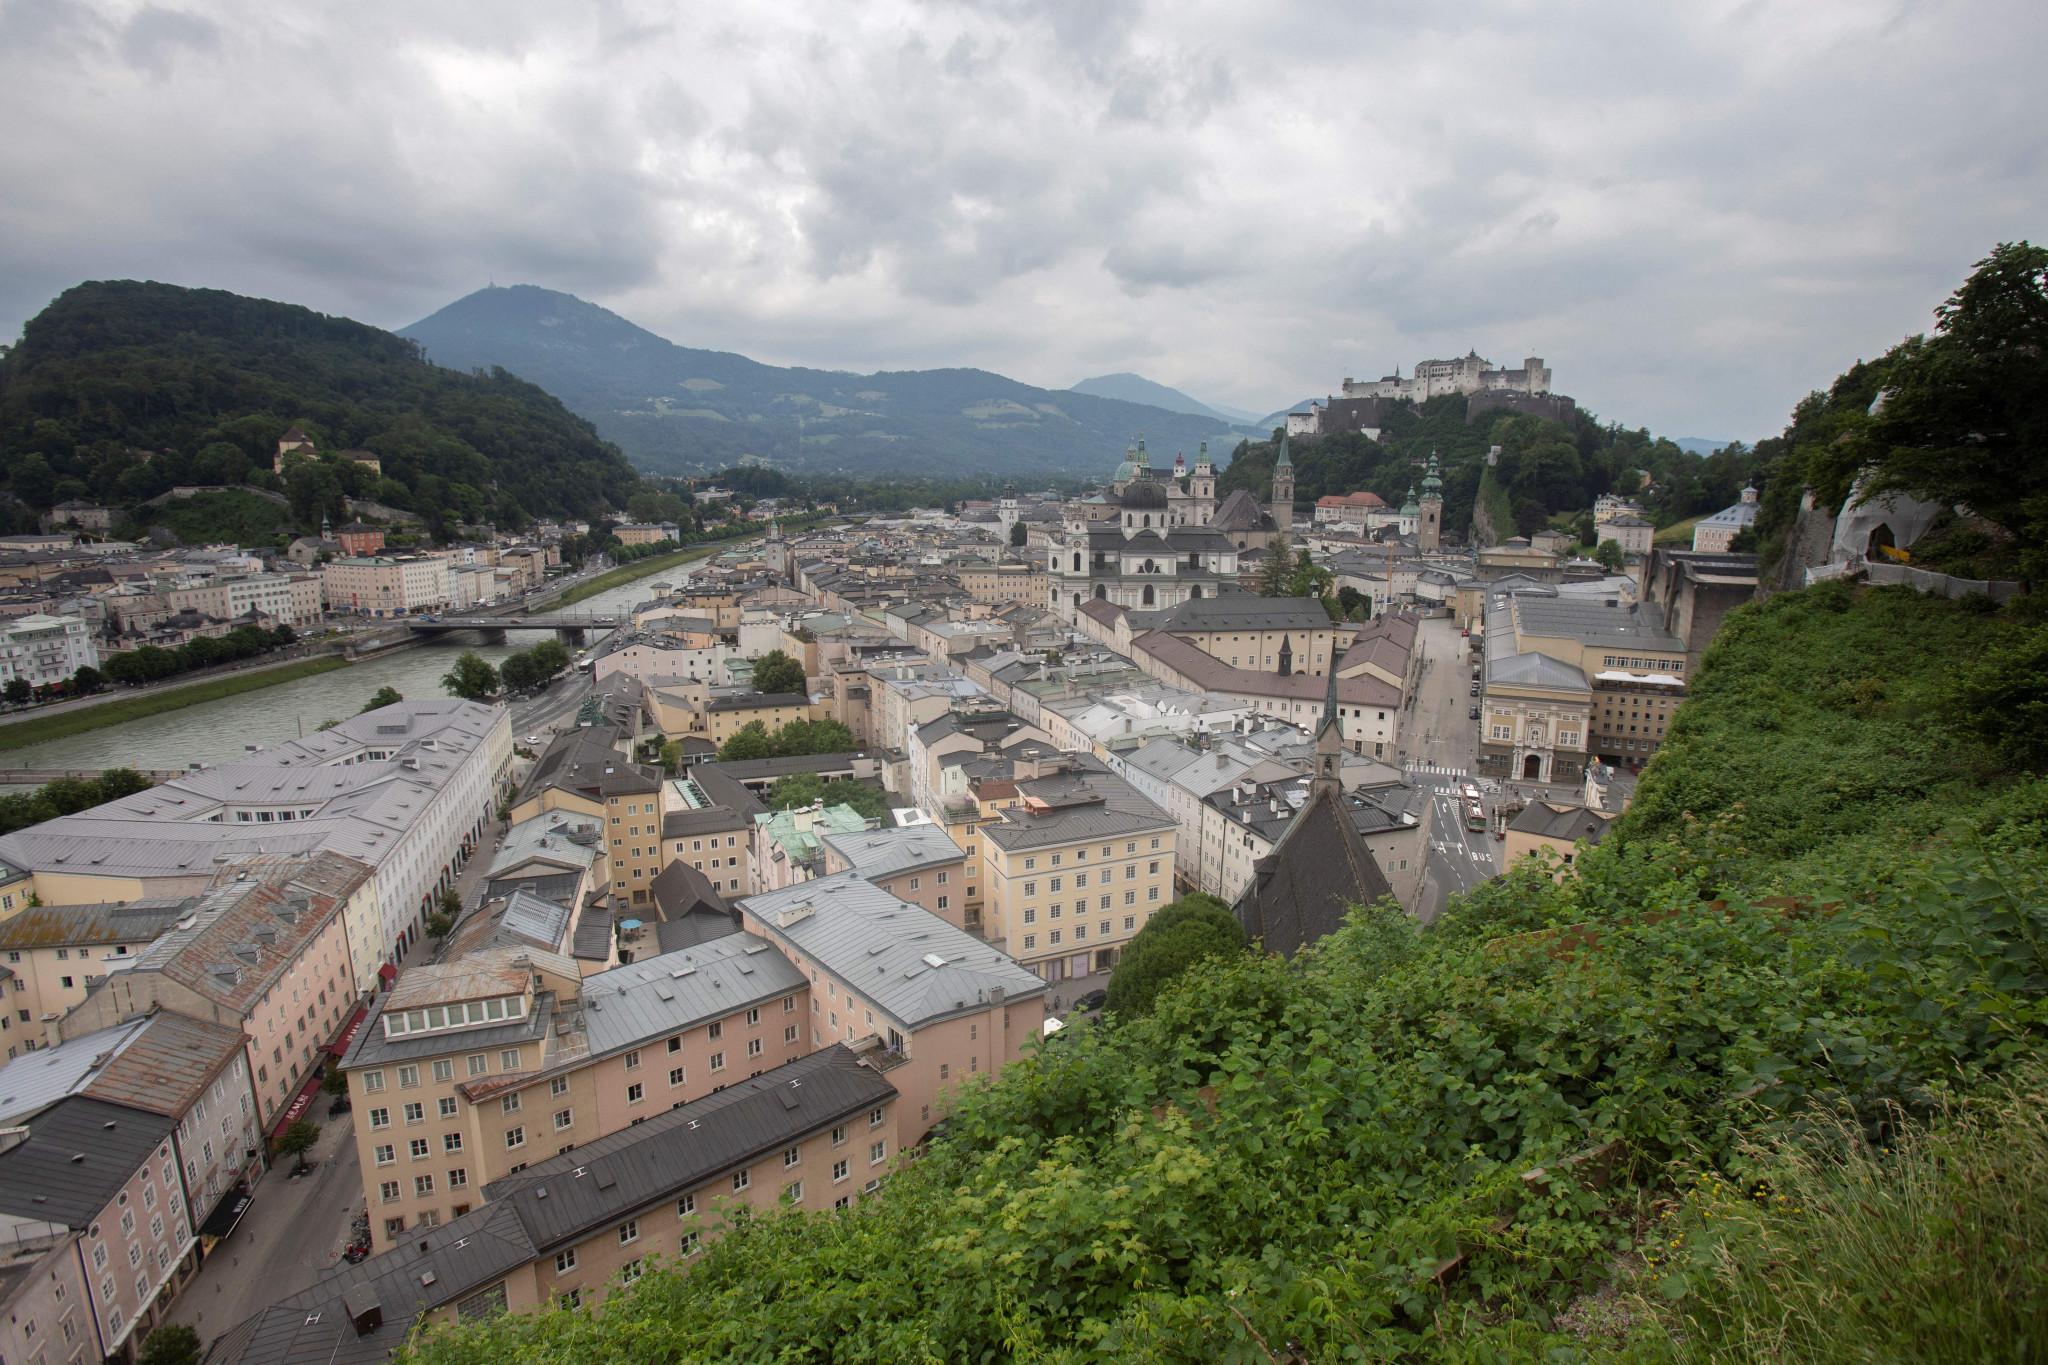 Salzburg announced as FIL Congress host a week before event set to begin